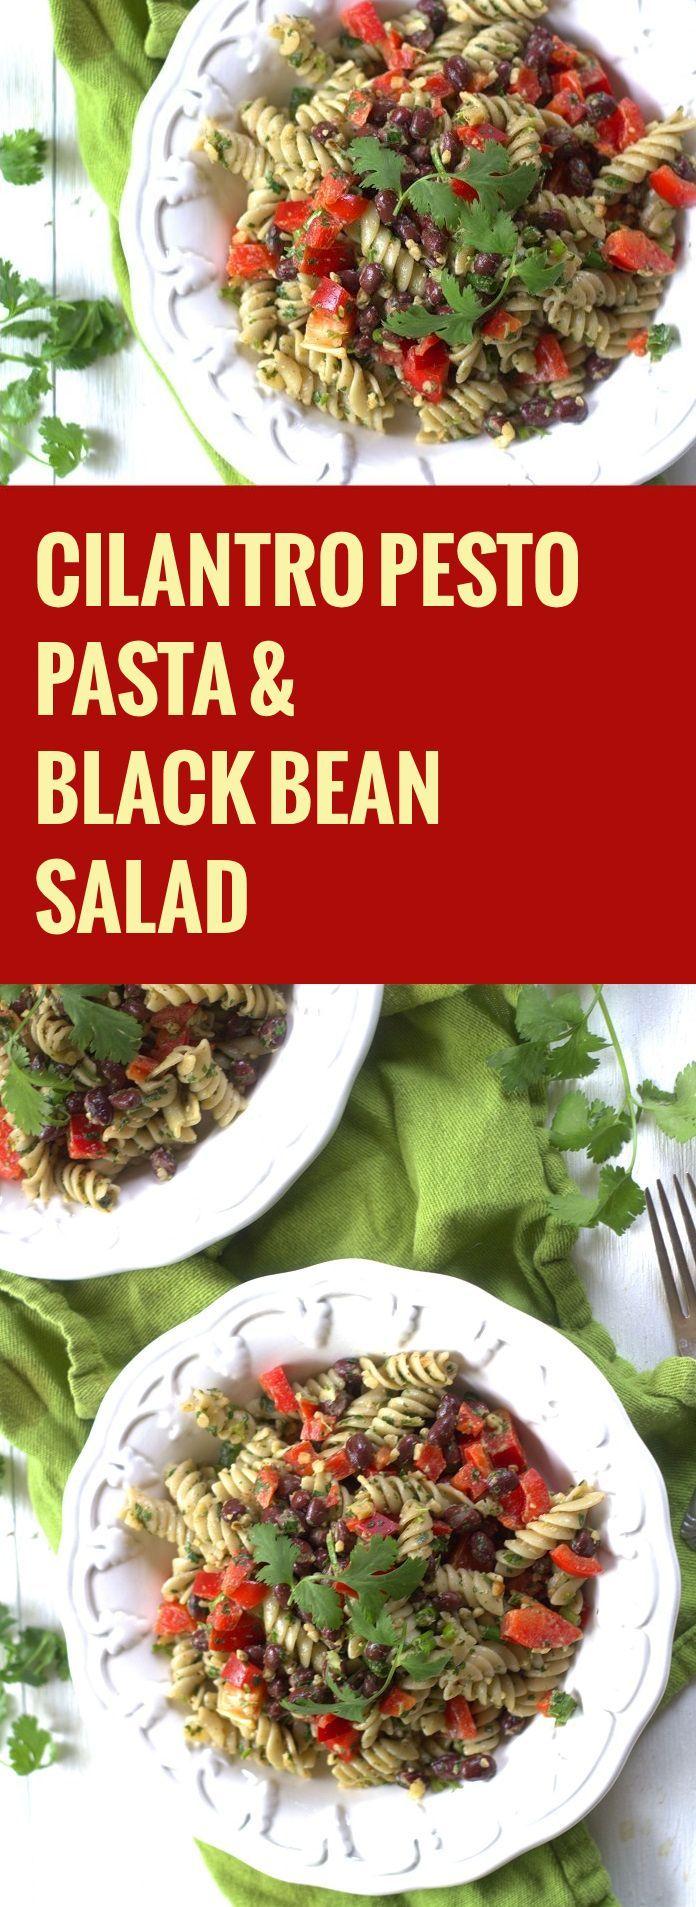 Cilantro Pesto Pasta and Black Bean Salad